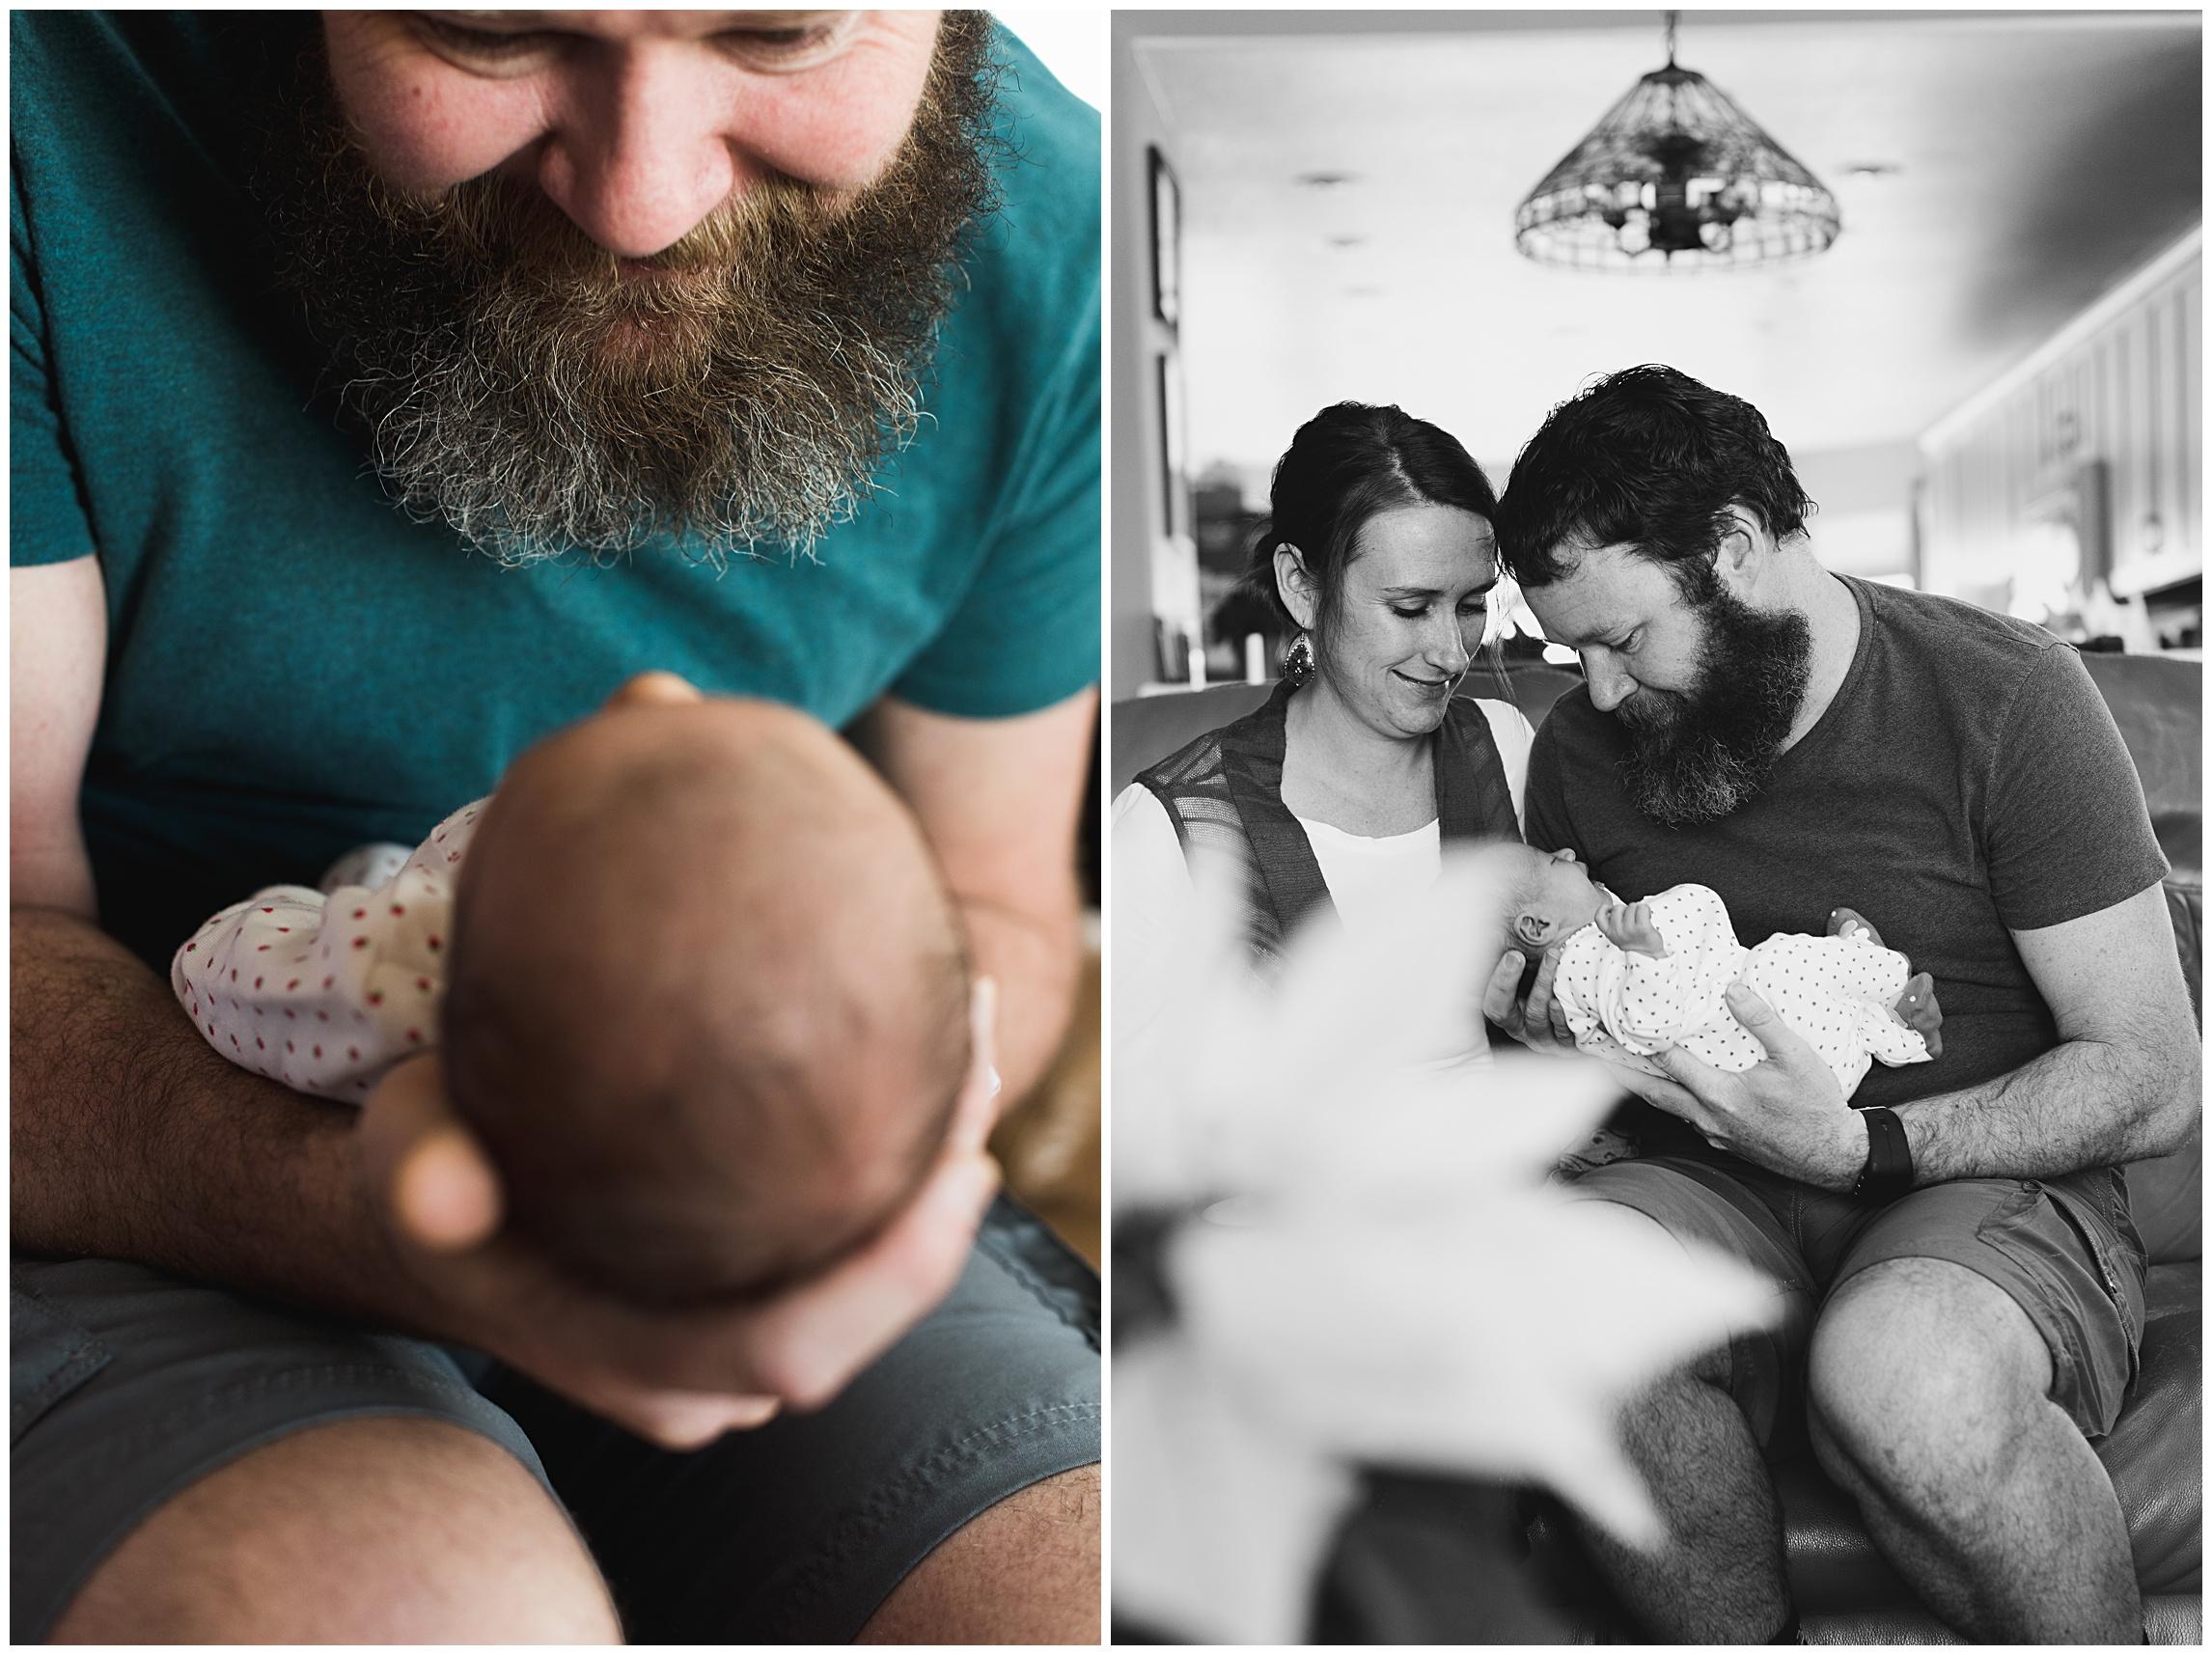 Proud parents hold their sleeping newborn baby girl. Film family portraits by Sonja Salzburg of Sonja K Photography.